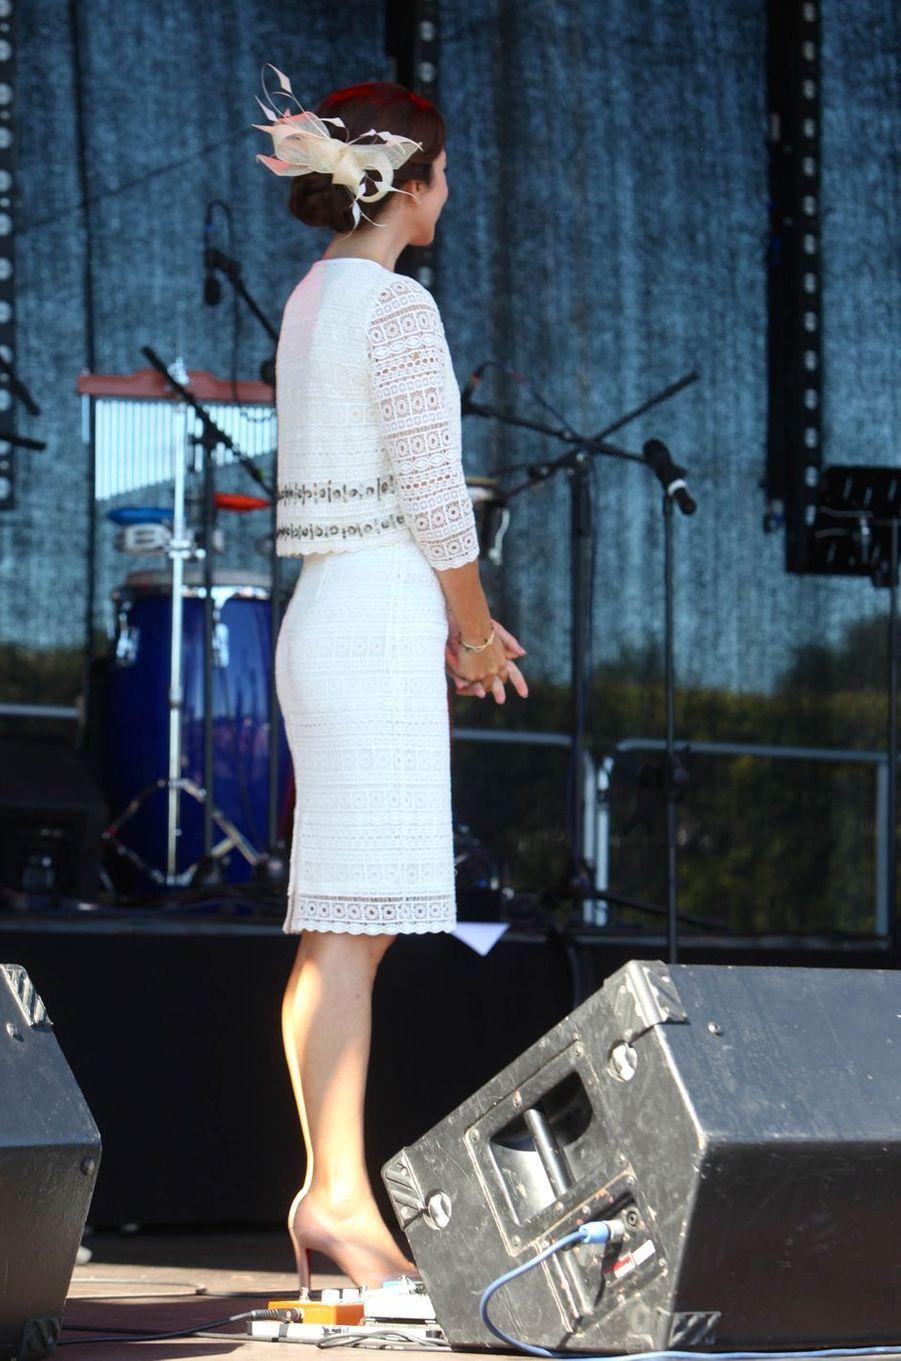 La princesse Mary de Danemark à Glostrup, le 27 août 2016